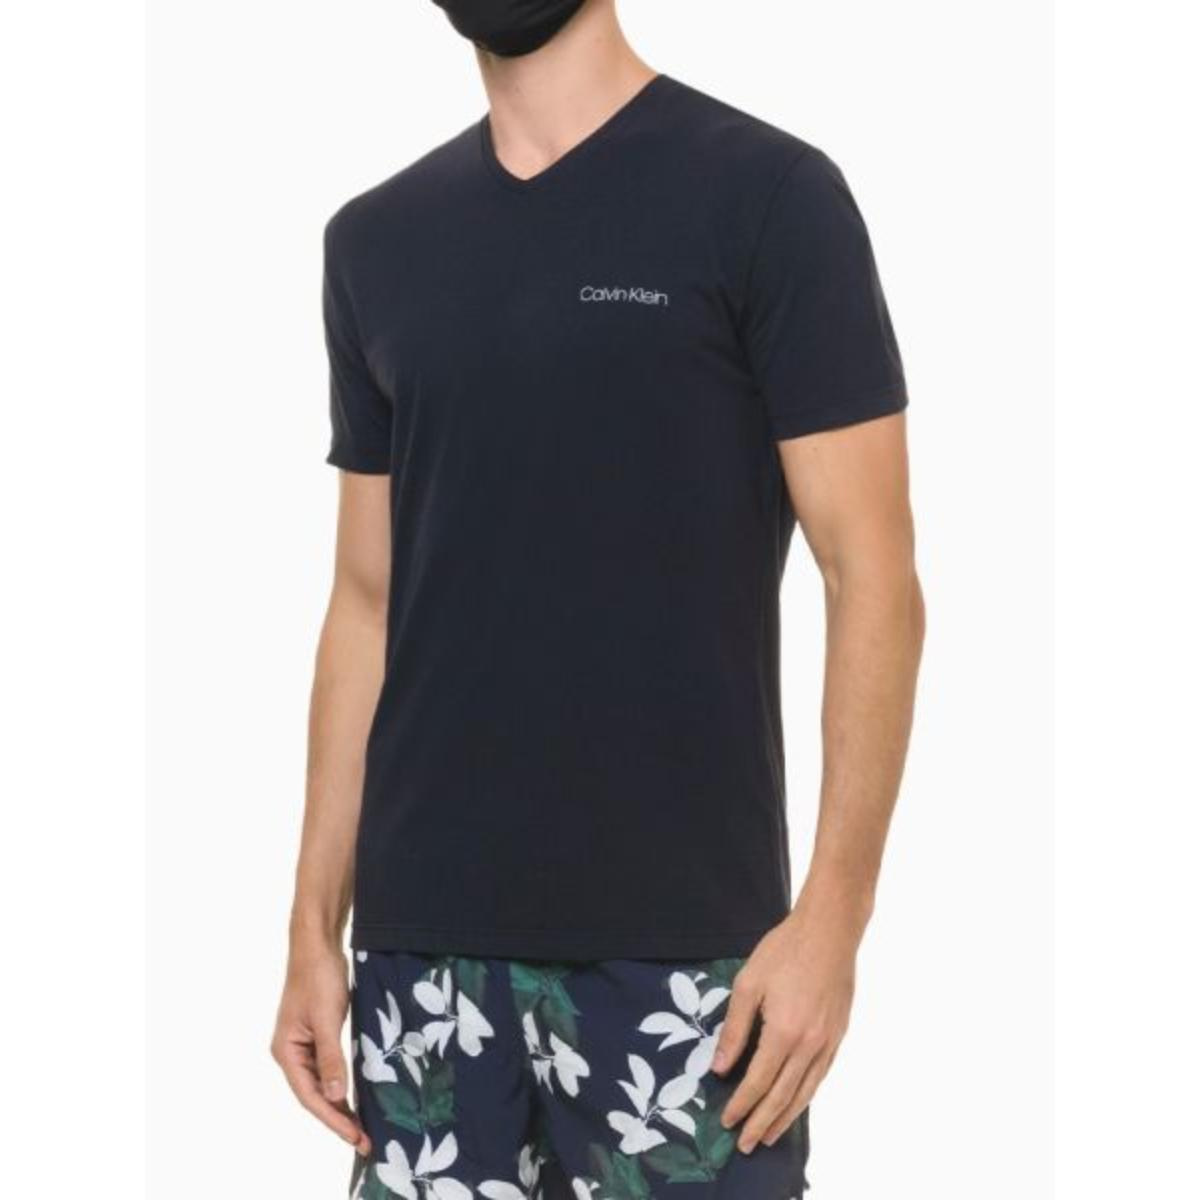 Camiseta Masculina Calvin Klein Cm1os01i3020 Marinho